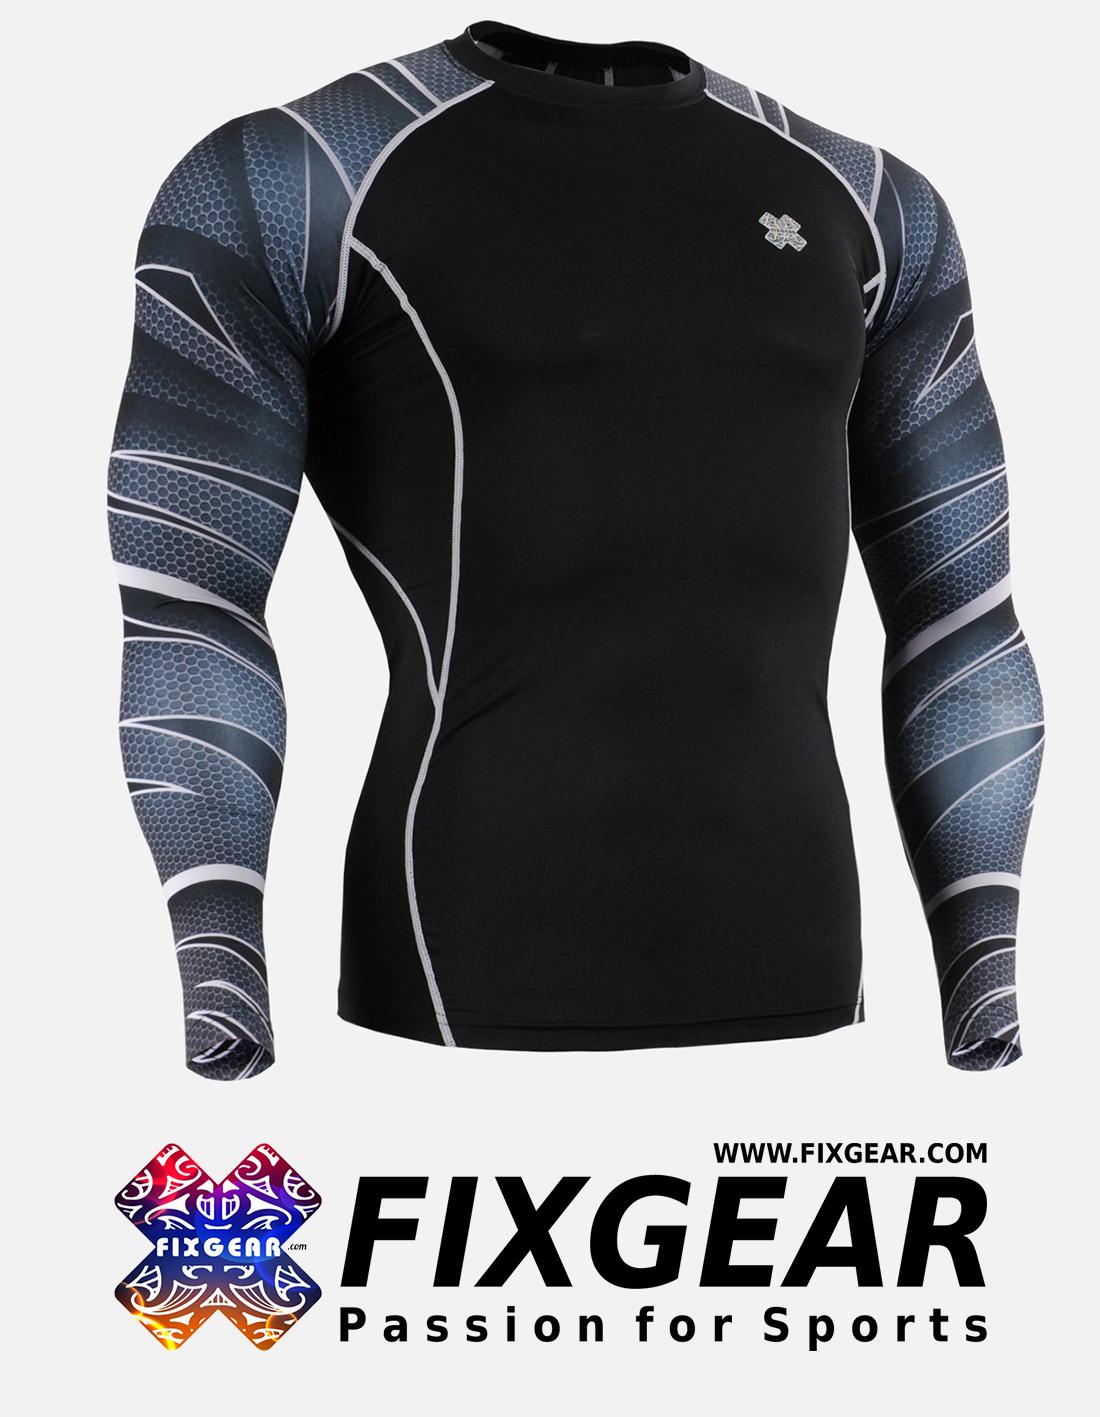 FIXGEAR CPD-B63 Compression Base Layer Shirt